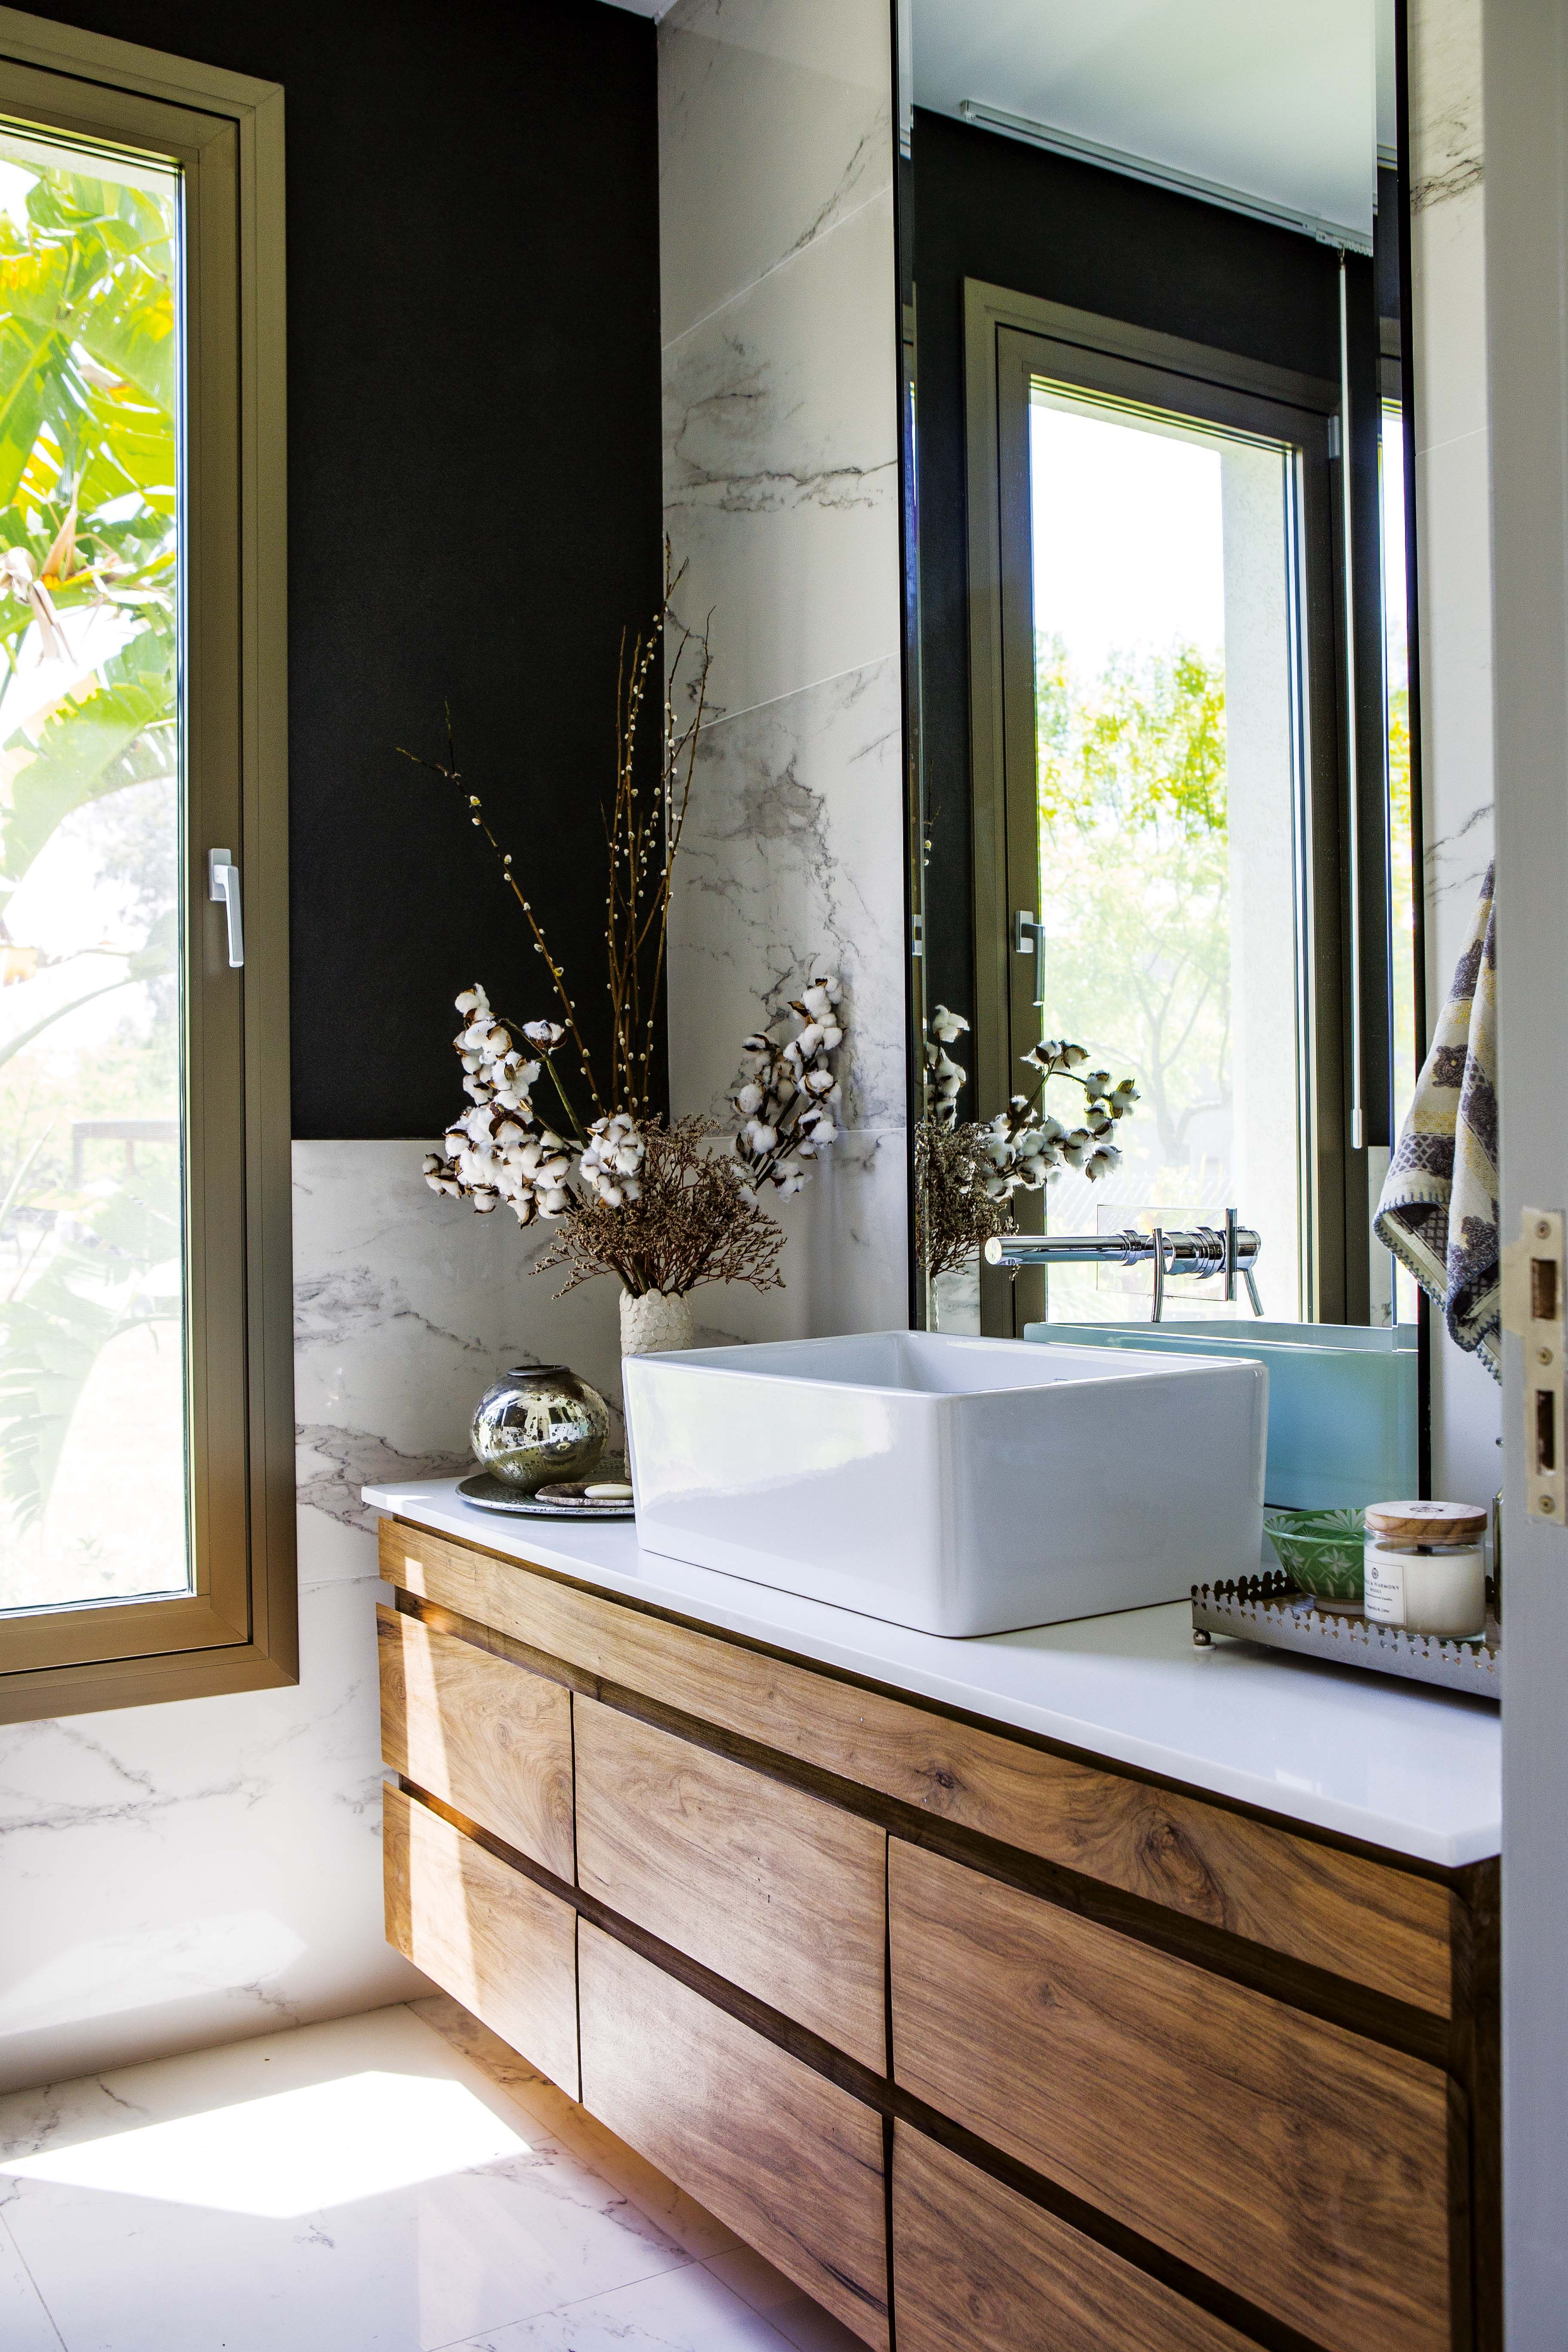 Toilette bohemio y moderno con piso de porcelanato \'Calacatta Lucido ...